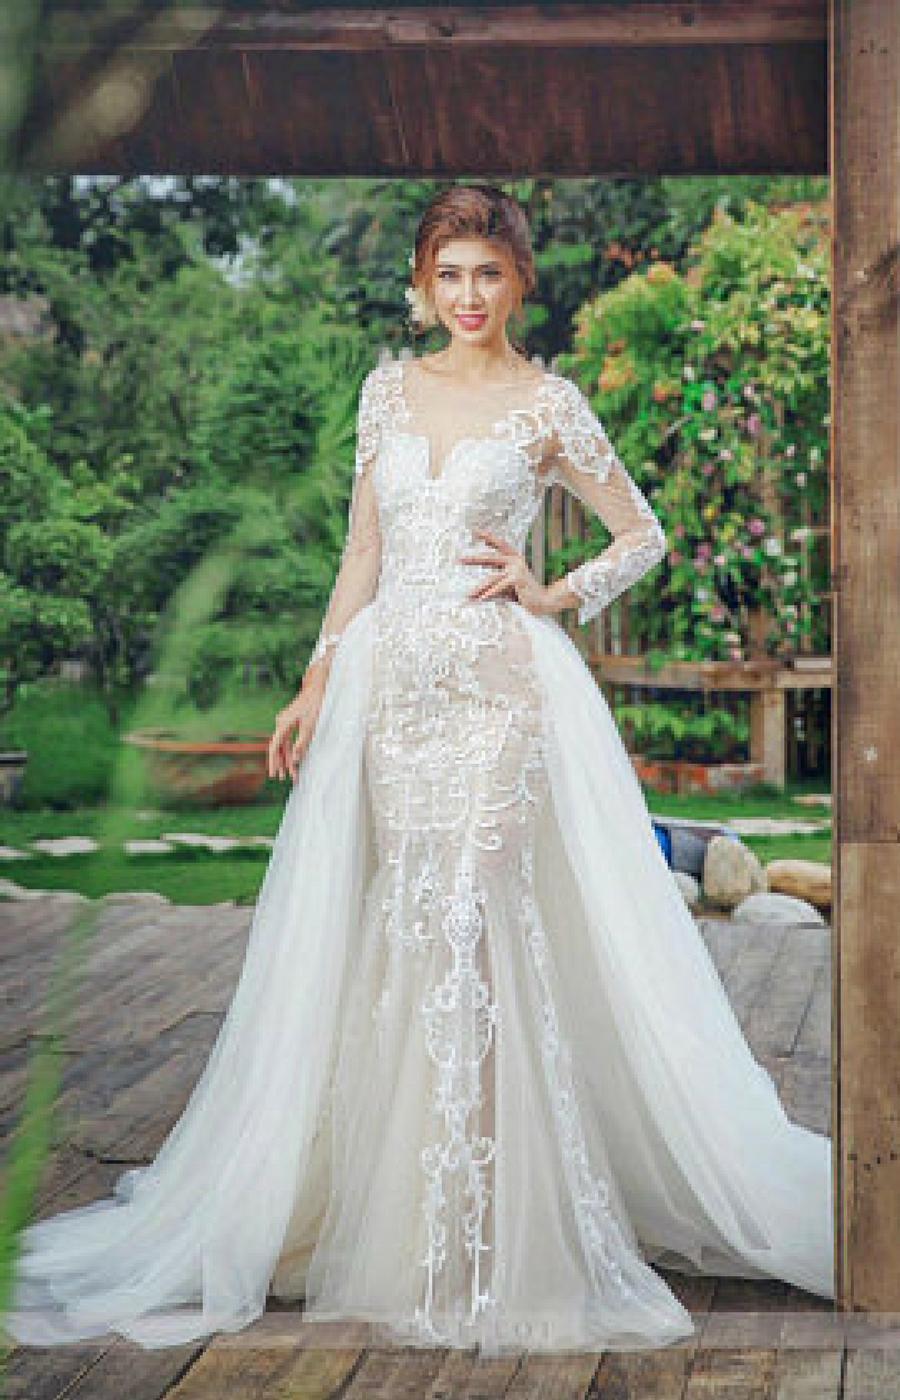 Romantic 2016 Wedding Dresses with Detachable Tulle